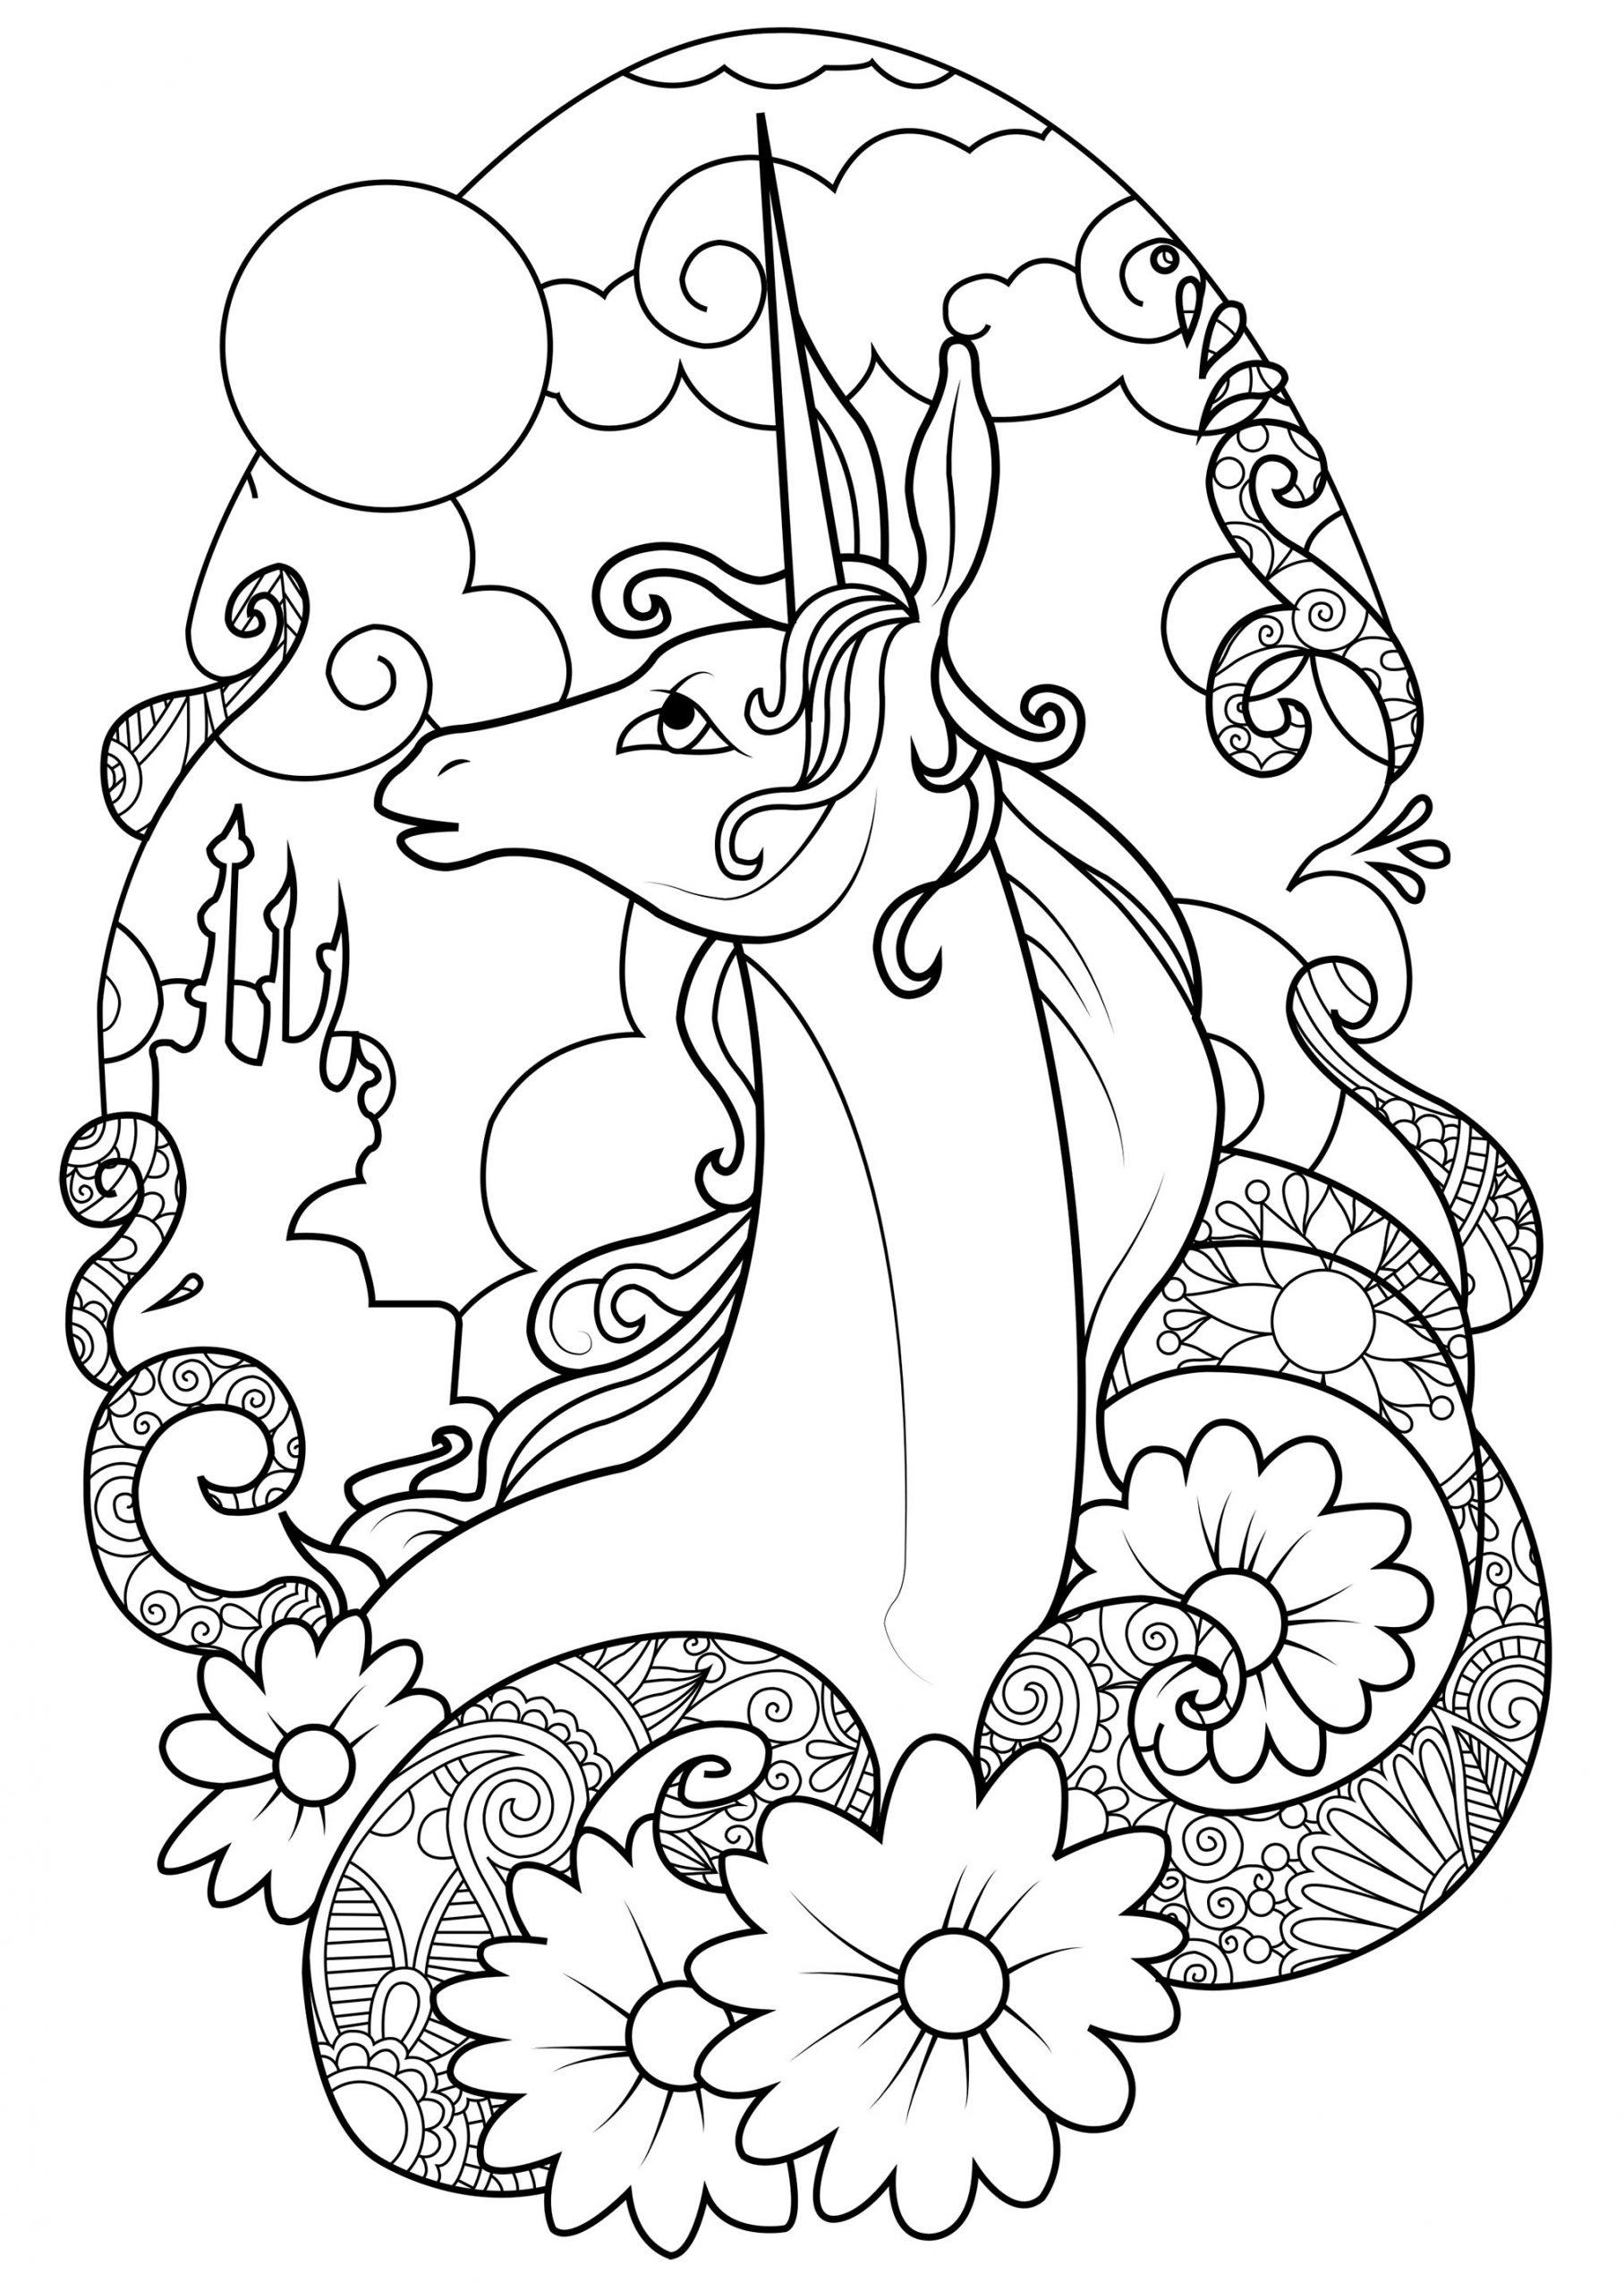 Unicorns Coloring Page Fairy Unicorn  Coloring Page